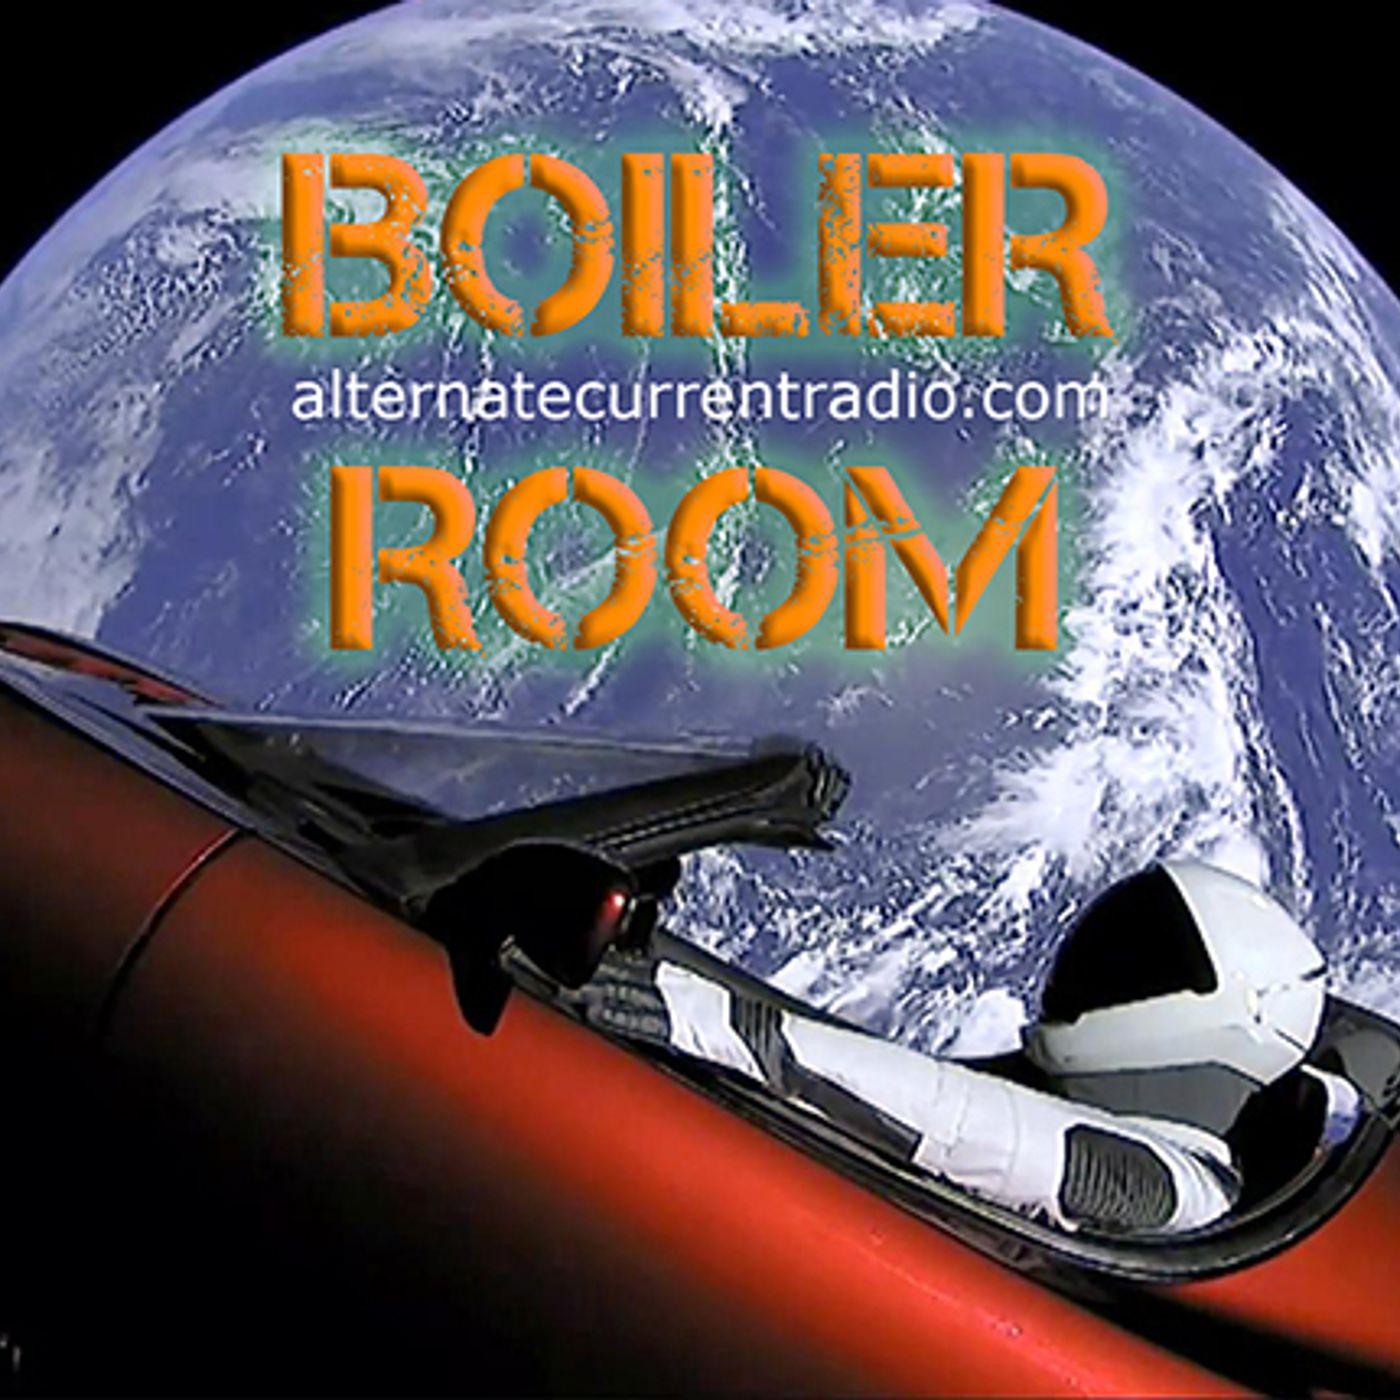 Summoning The Transhuman Golem & Teslas In Space - BOILER ROOM EP #237